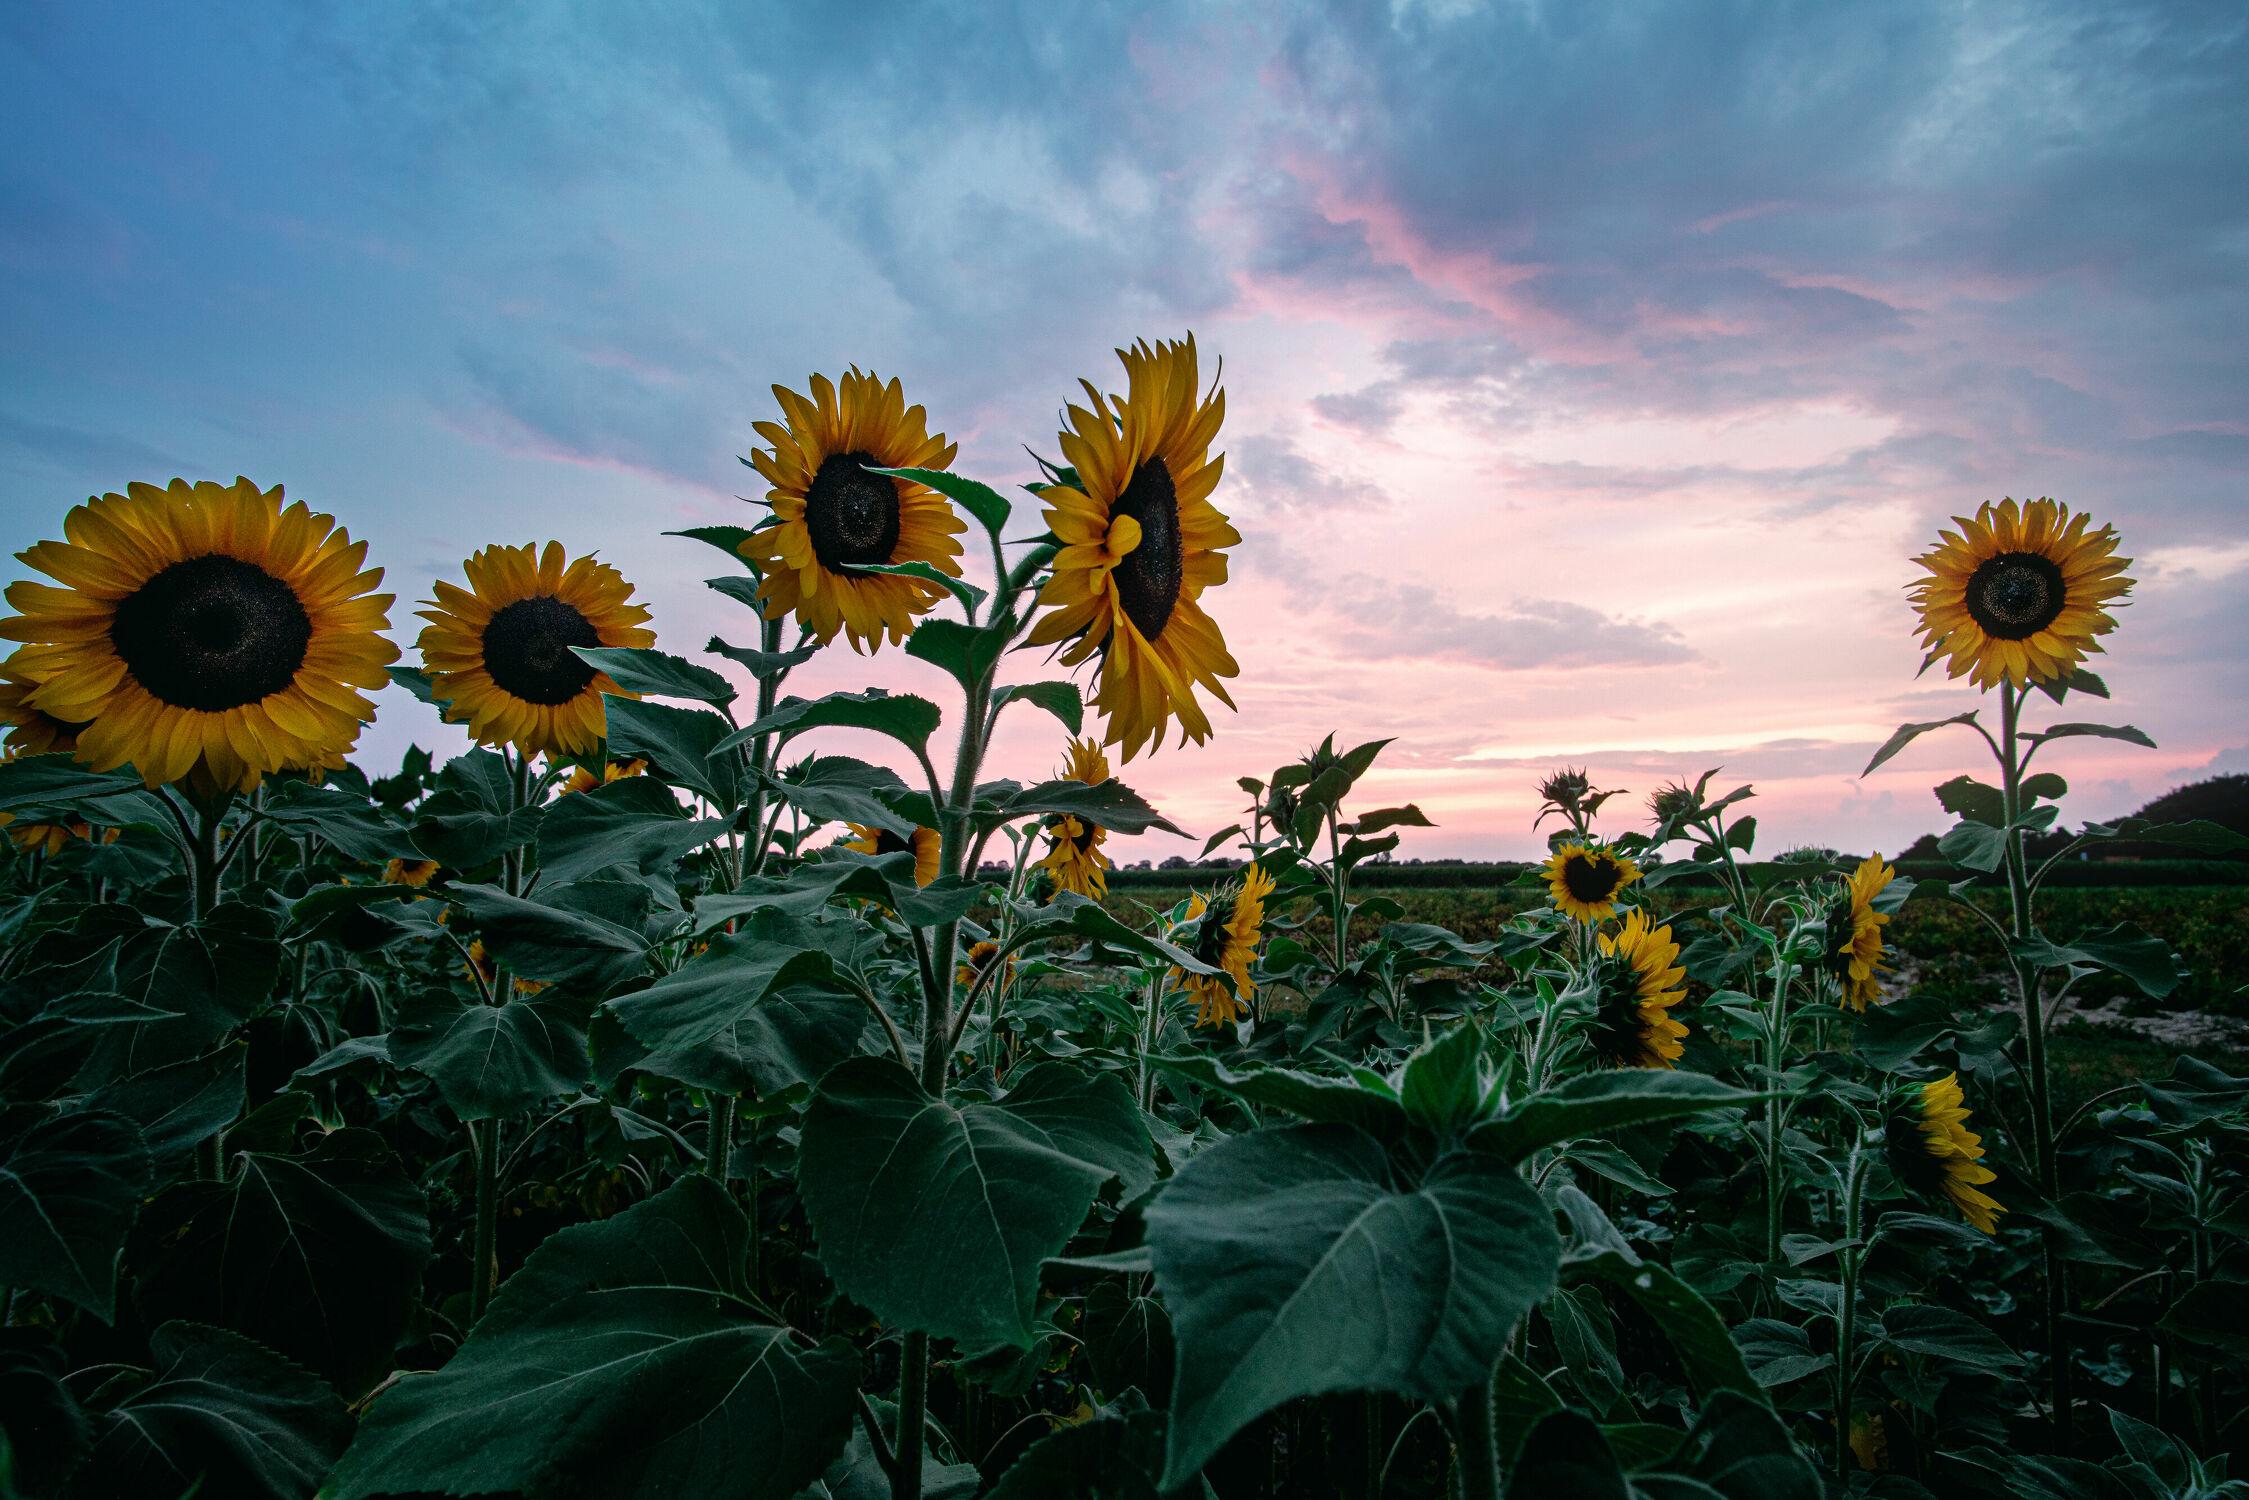 Bild mit Natur, Pflanzen, Blumen, Sonnenuntergang, Sonnenaufgang, Abendrot, Sonnenblumen, Landschaft, Feld